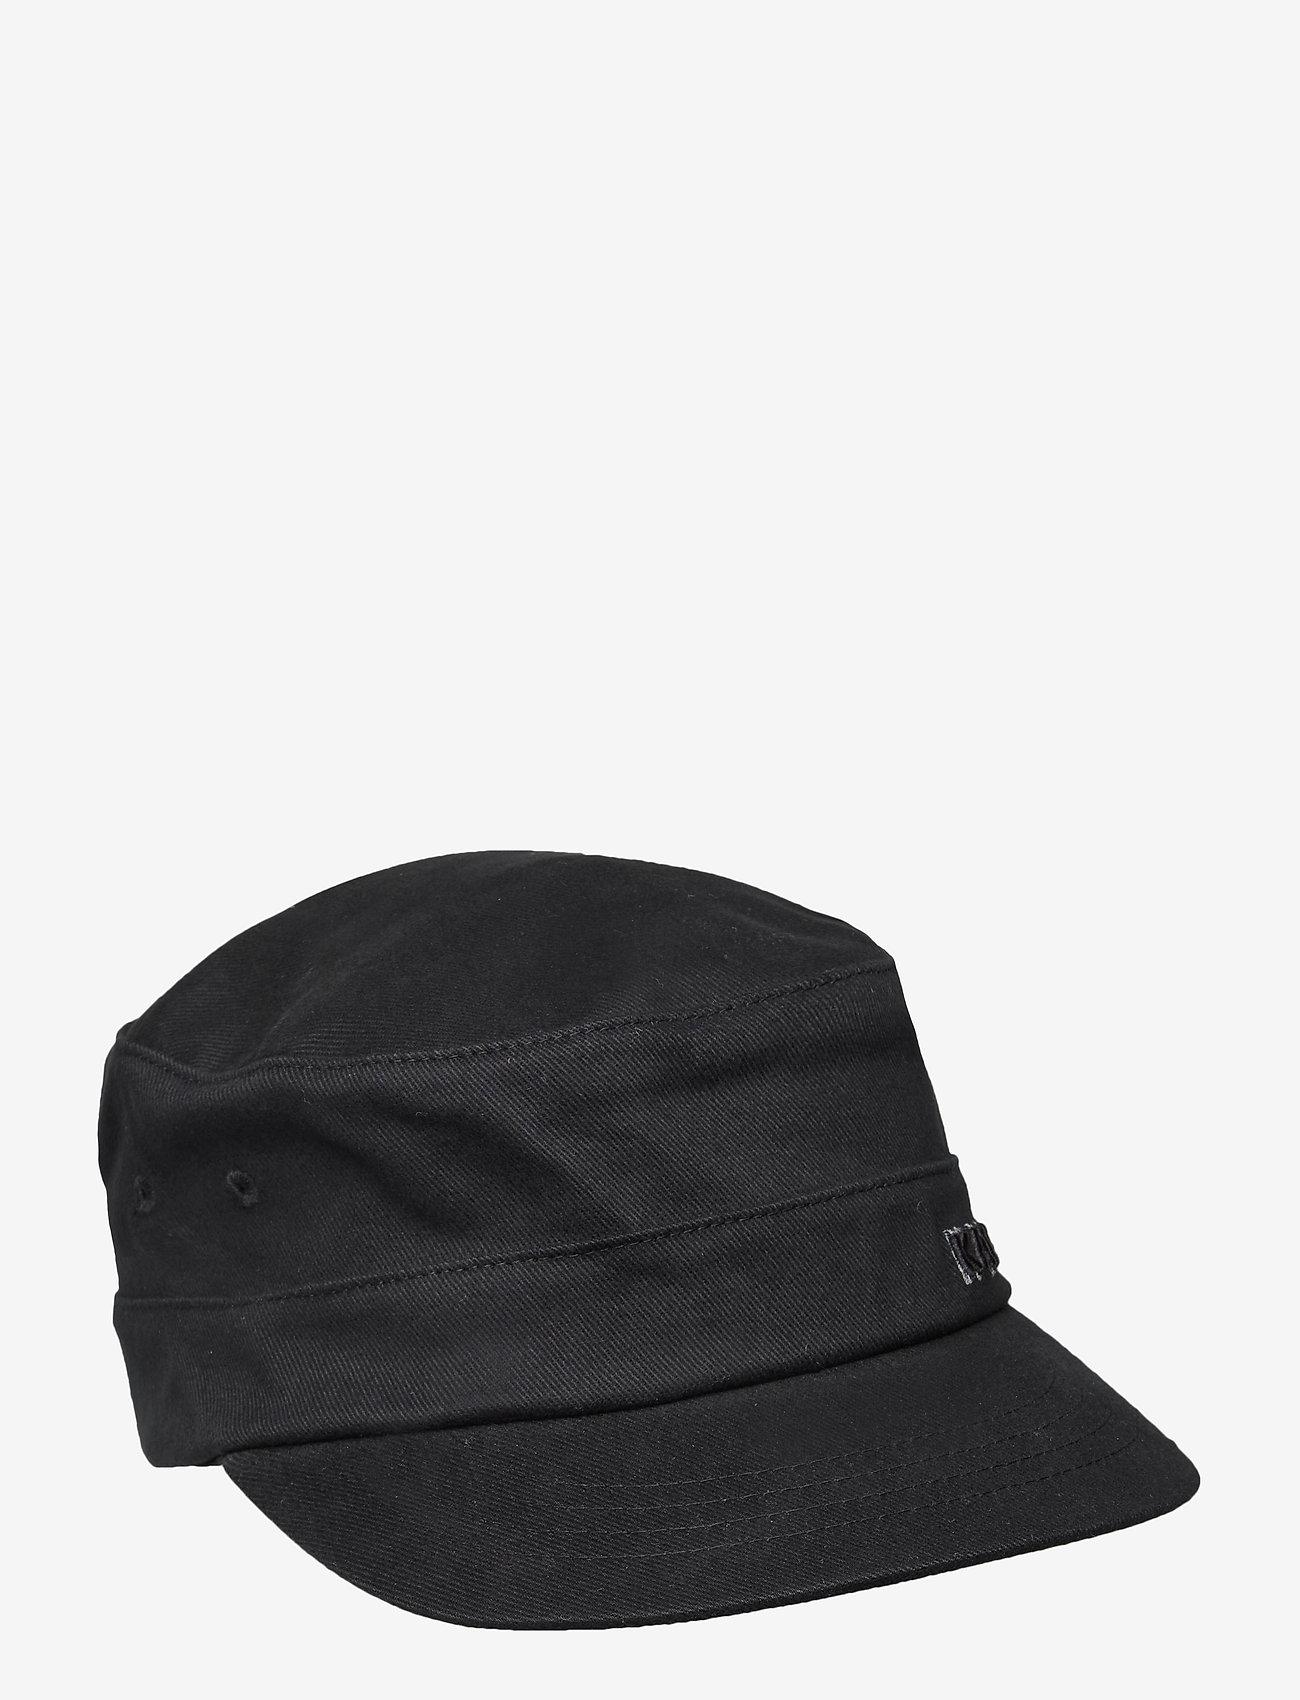 Kangol - KG COTTON TWILL ARMY CAP - kasketter - black - 0